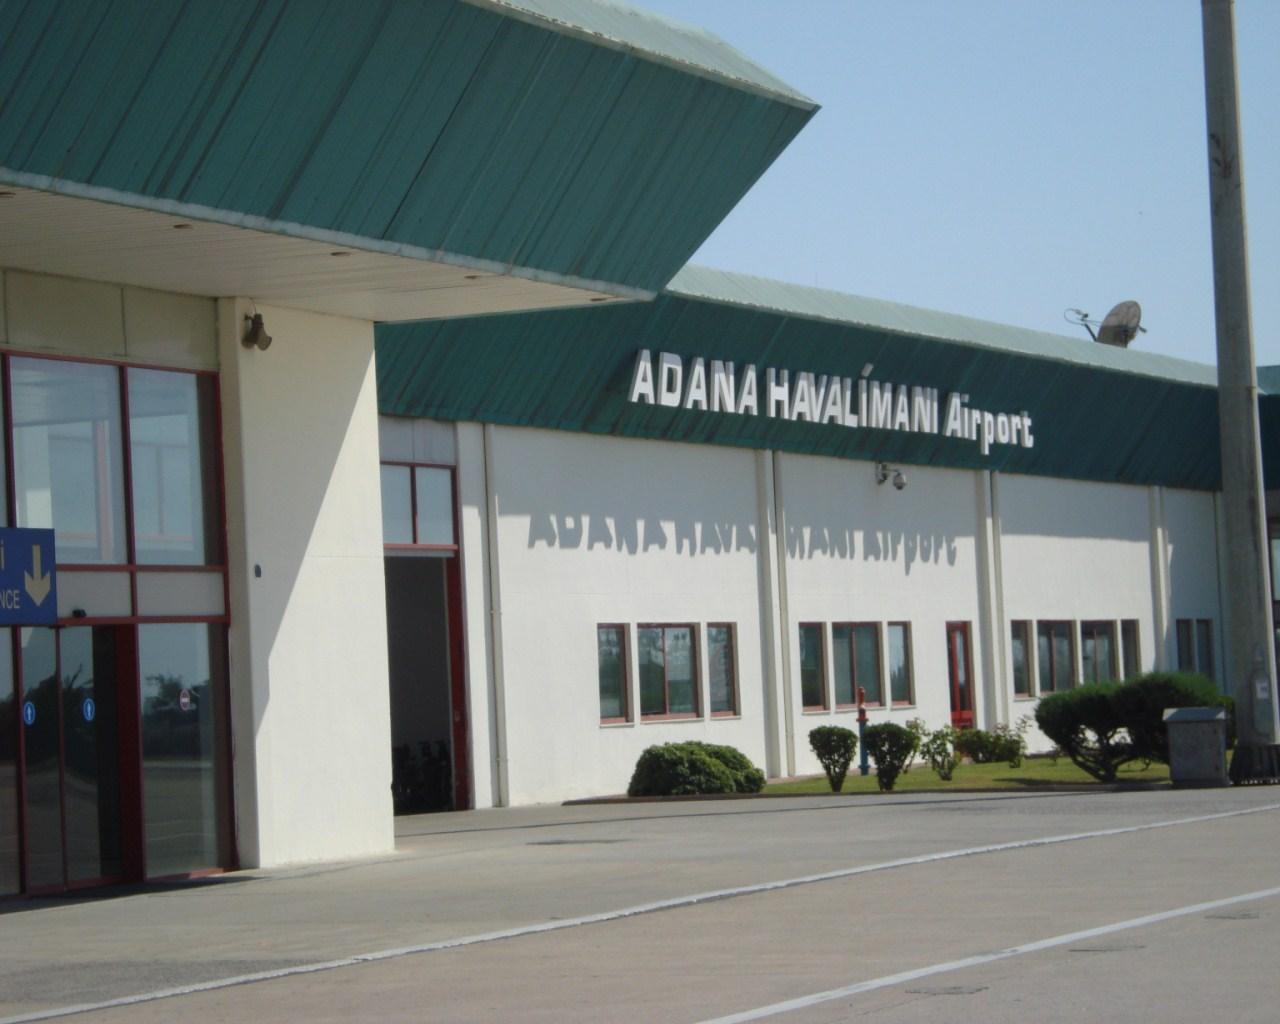 Аэровокзал аэропорта Адана